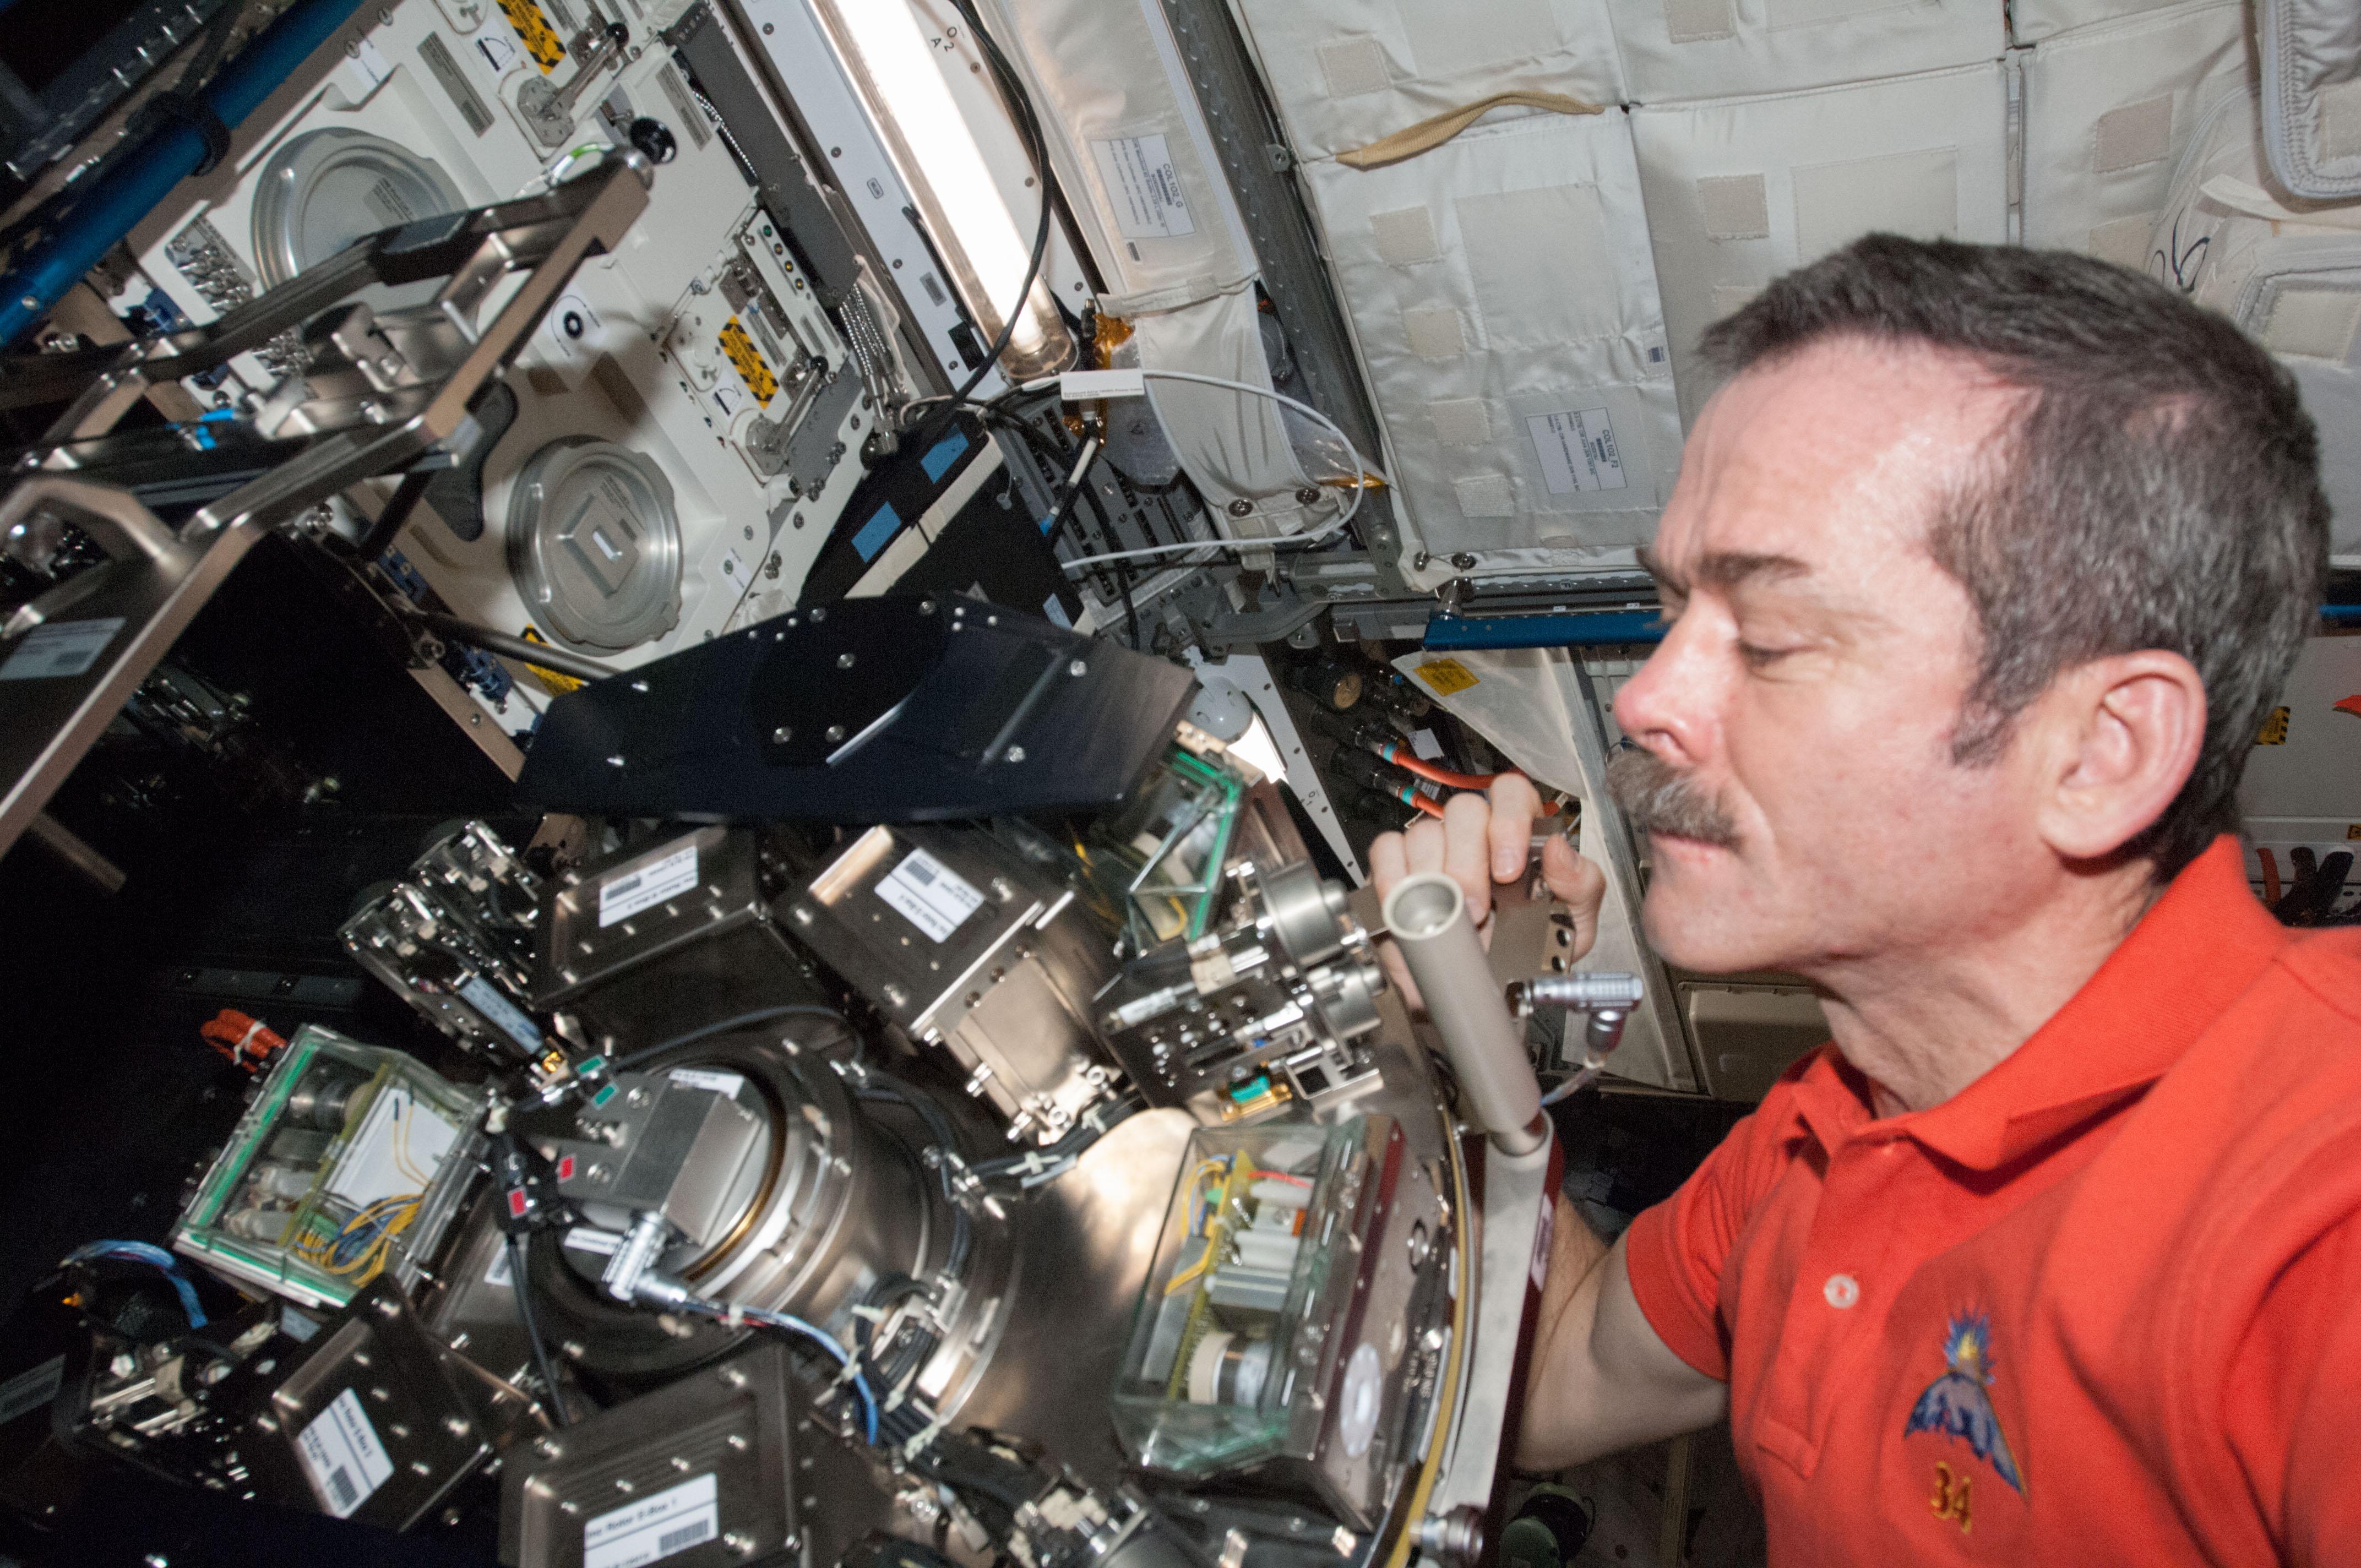 canadian space agency astronaut chris hadfield - photo #20